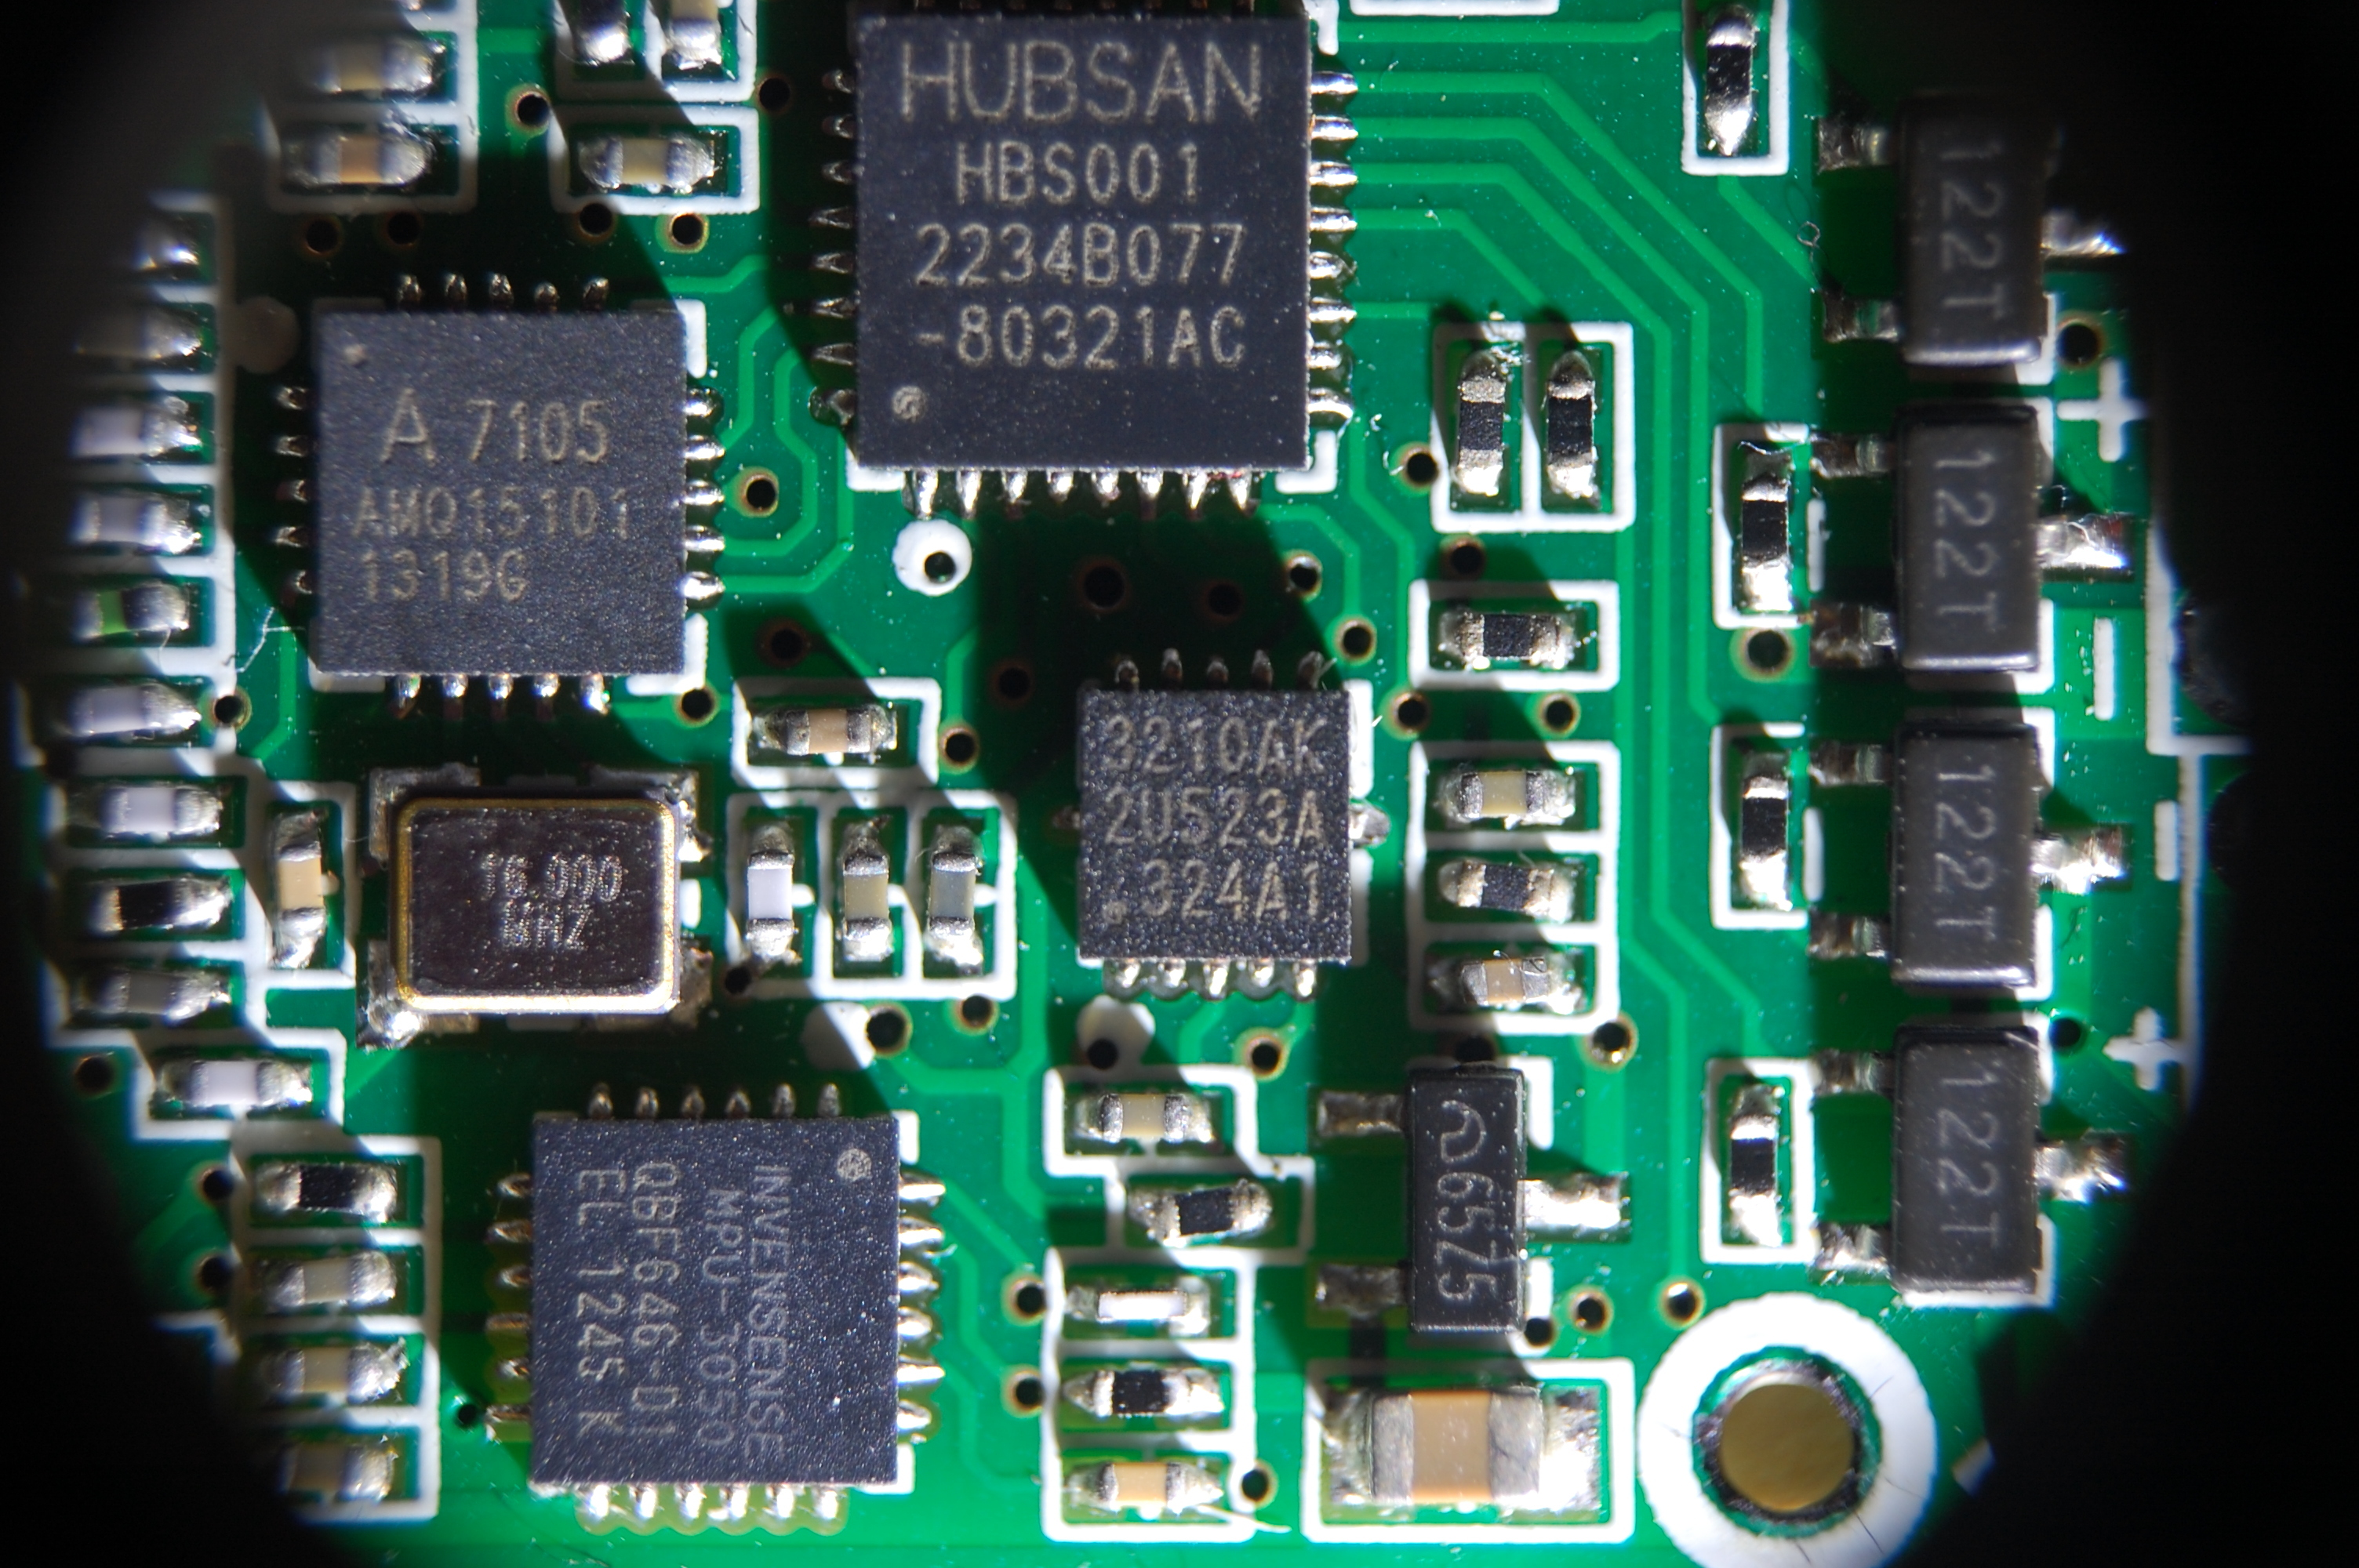 pcb_top_macro github lgeek h107_rev reverse engineering hubsan h107* micro hubsan x4 h107c wiring diagram at cos-gaming.co